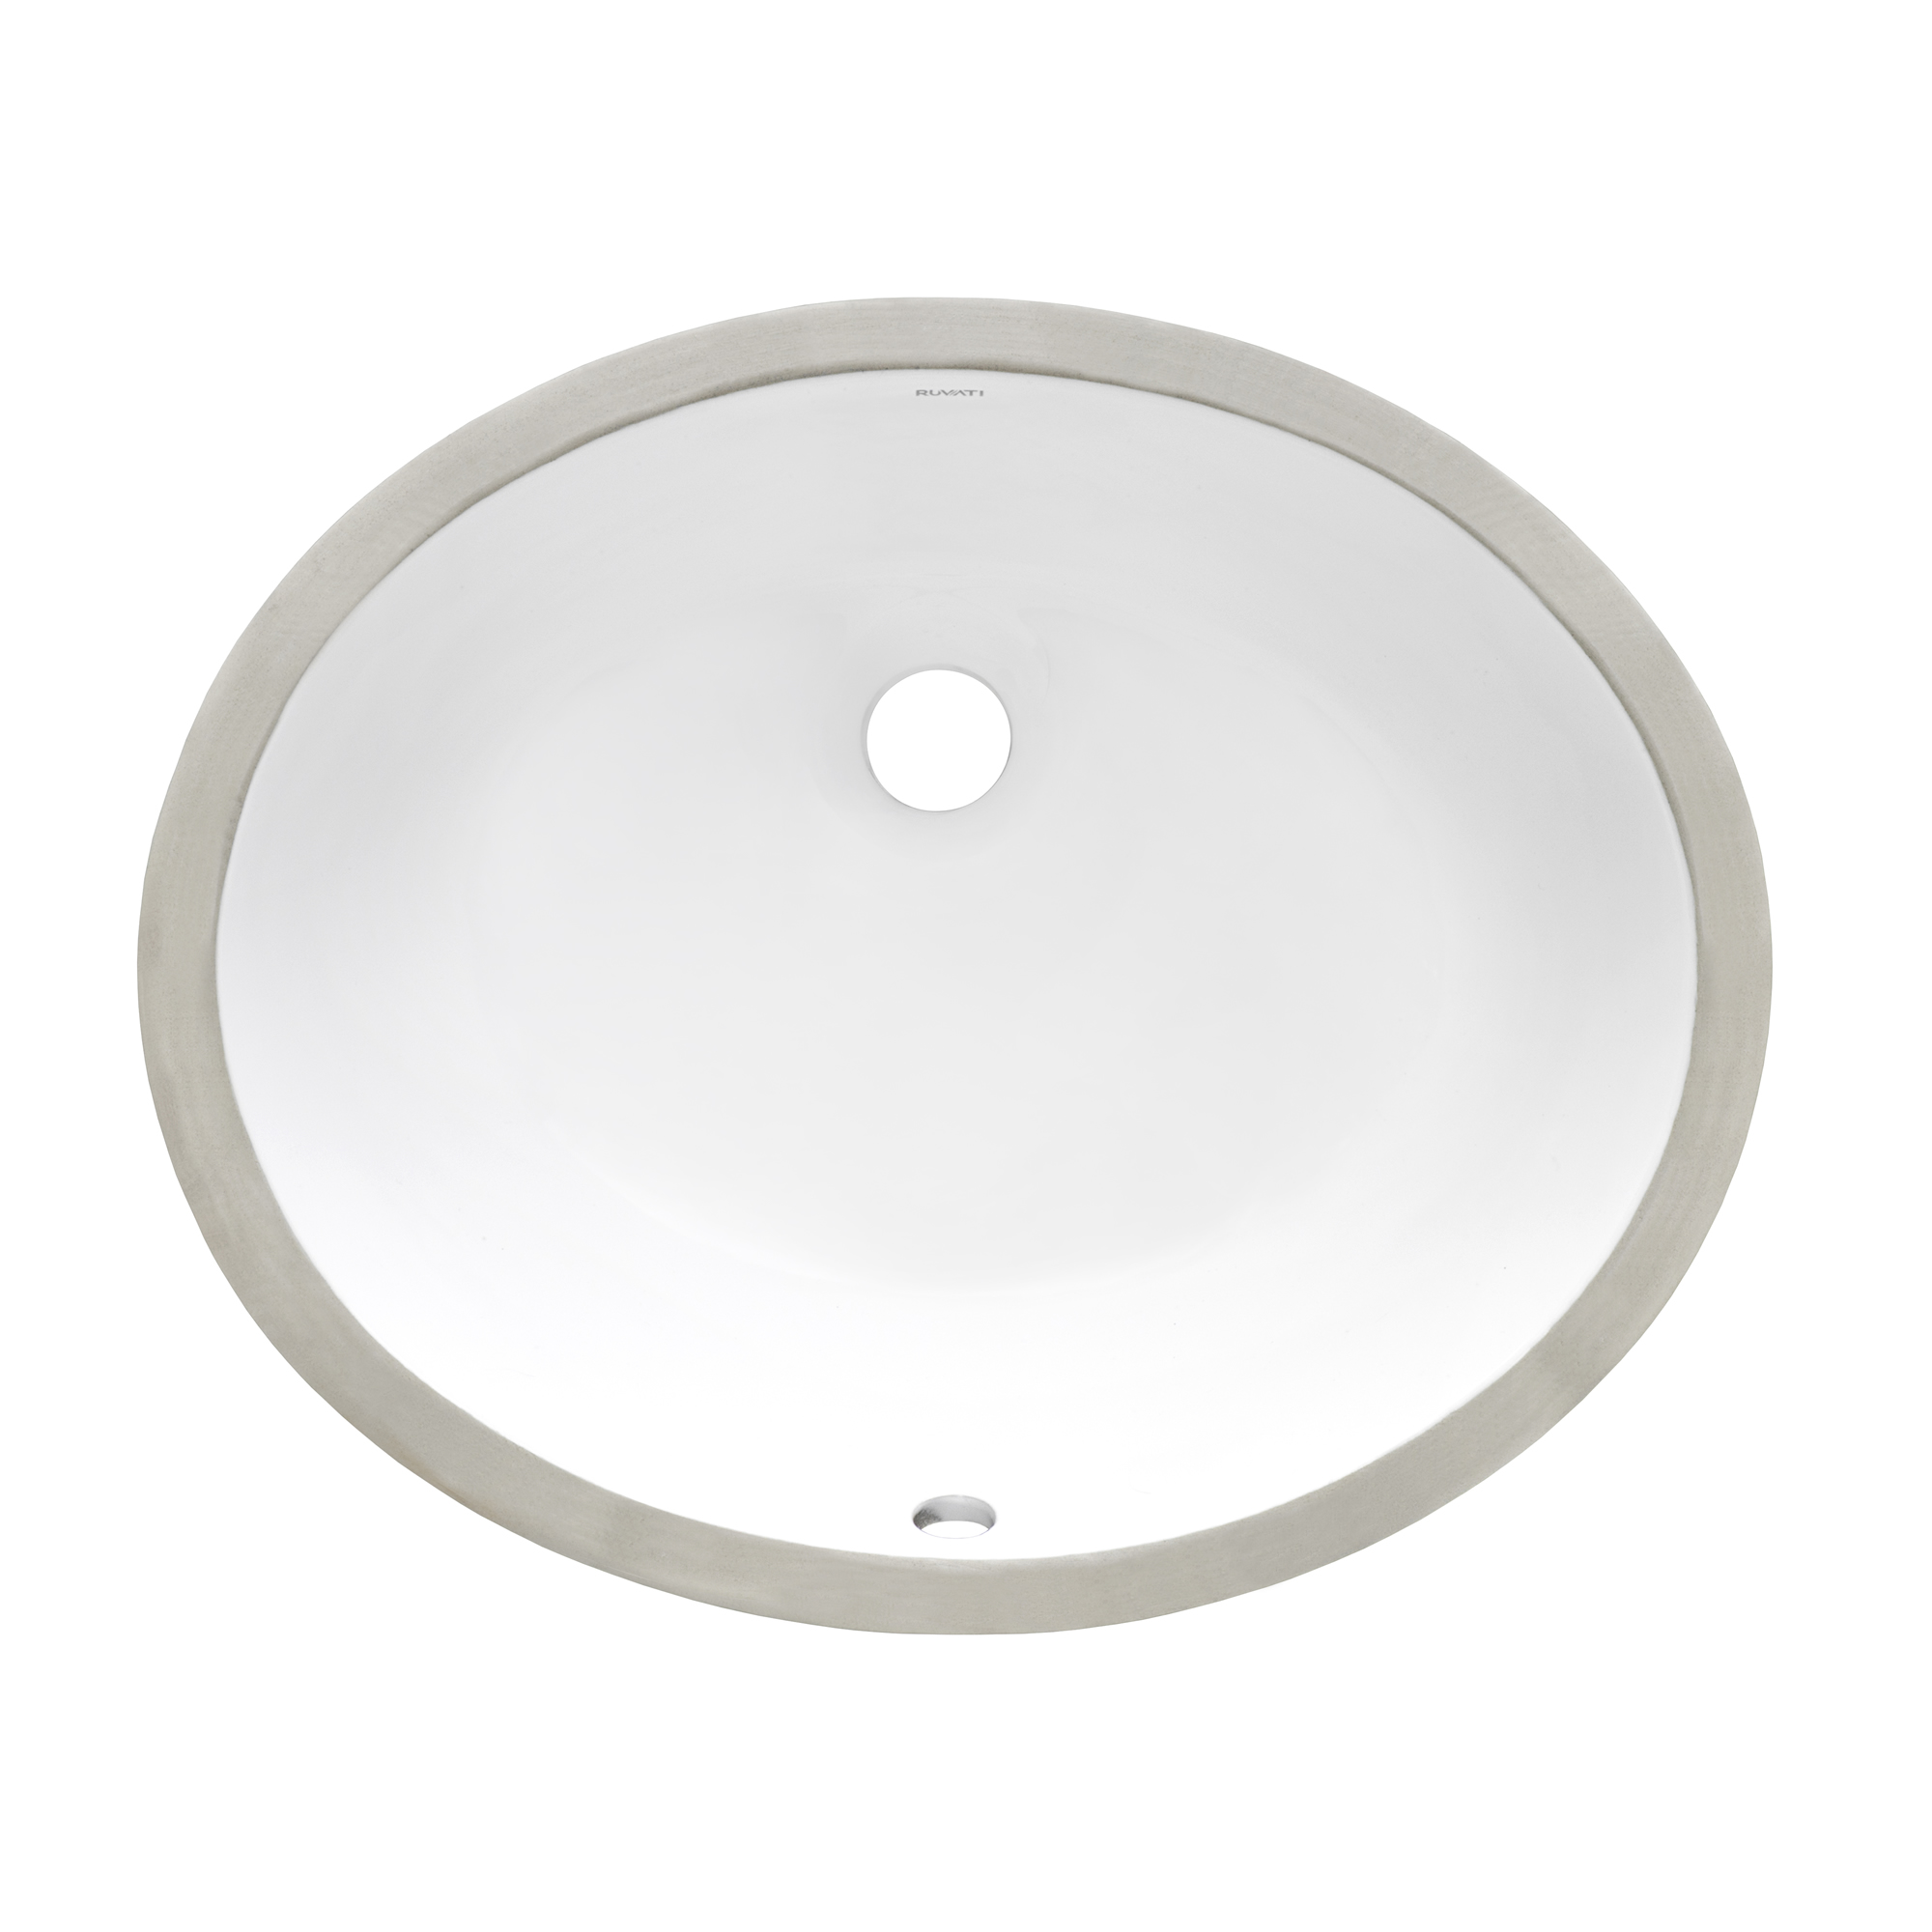 18 X 15 Inch Undermount Bathroom Sink White Oval Porcelain Ceramic With Overflow Ruvati Usa